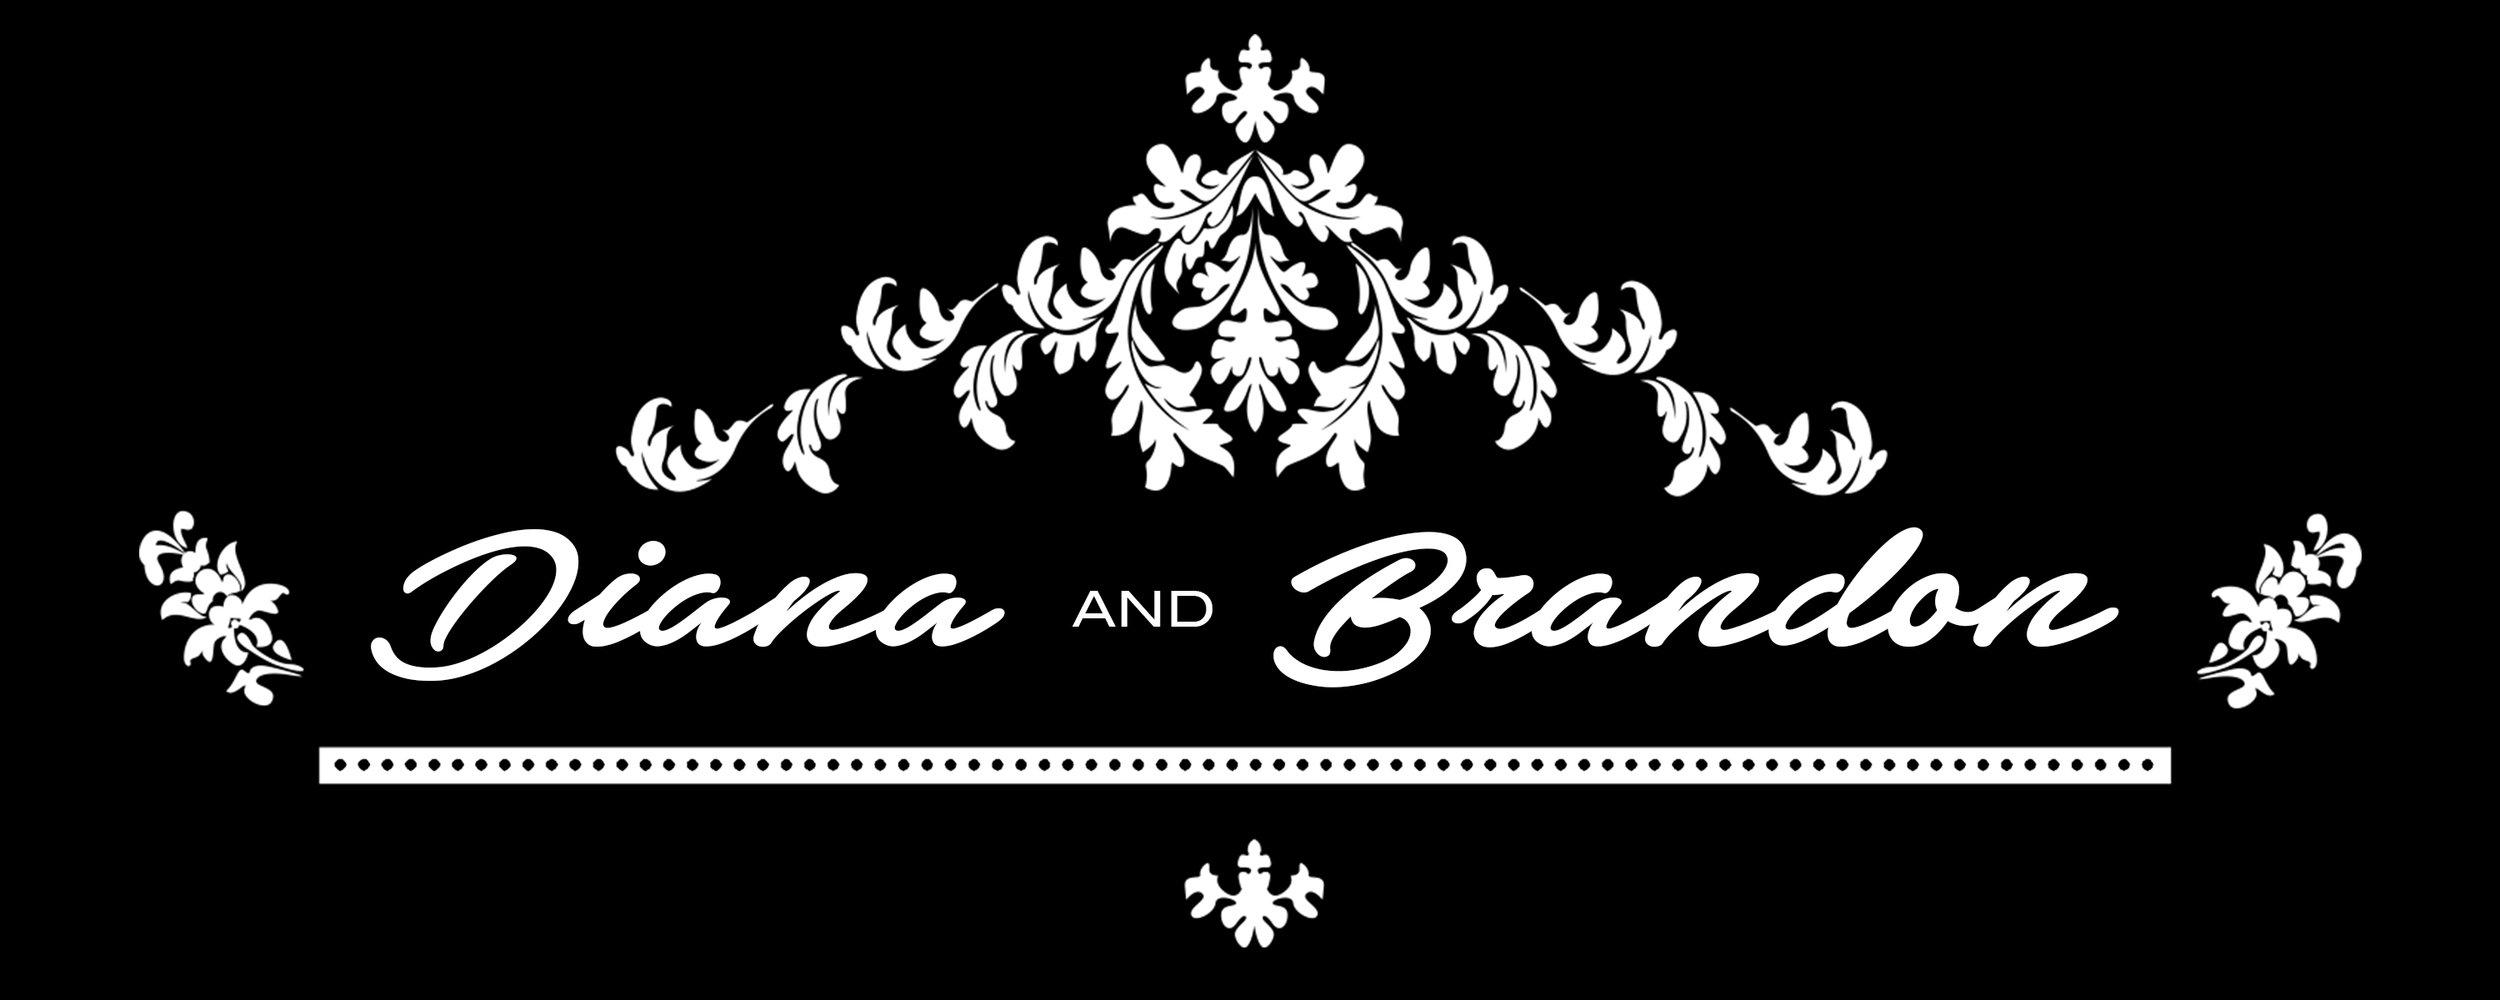 Diana Brandon Projector.jpg